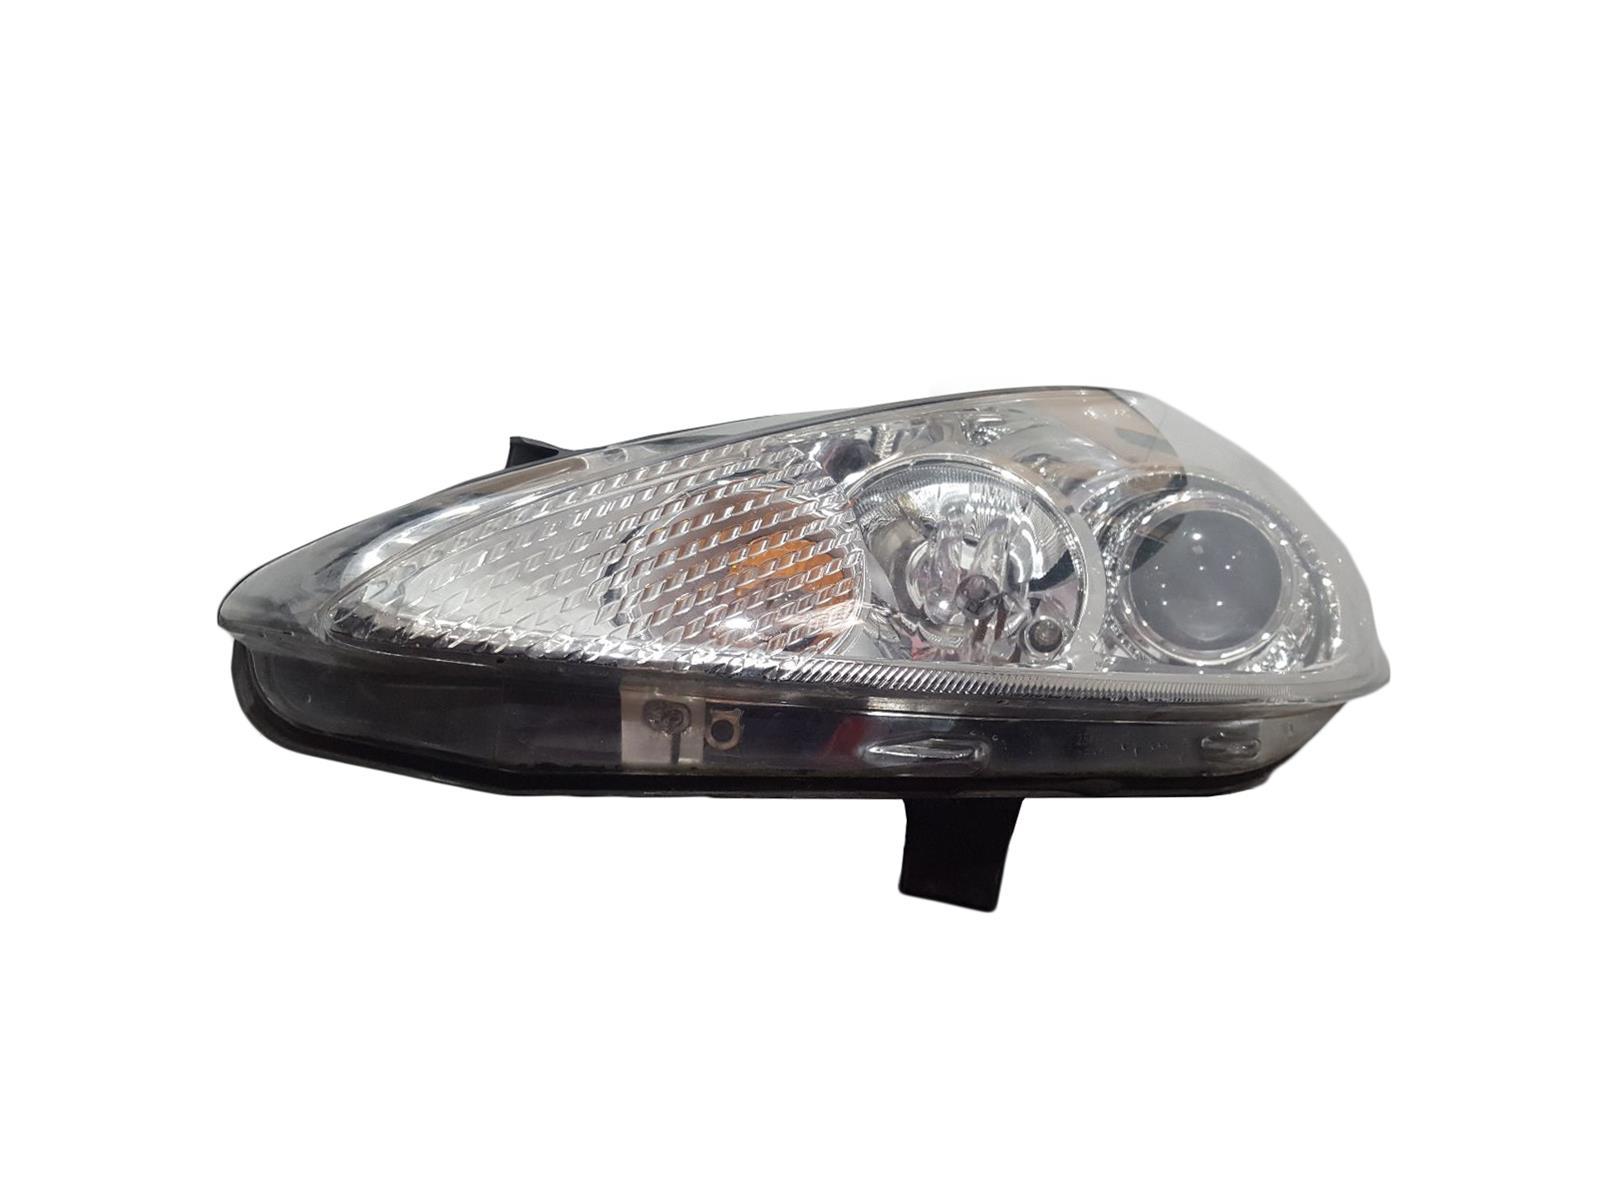 Ford Fiesta 2009 To 2012  N/S Left Passengers Headlamp Headlight 8A61-13W030-DF